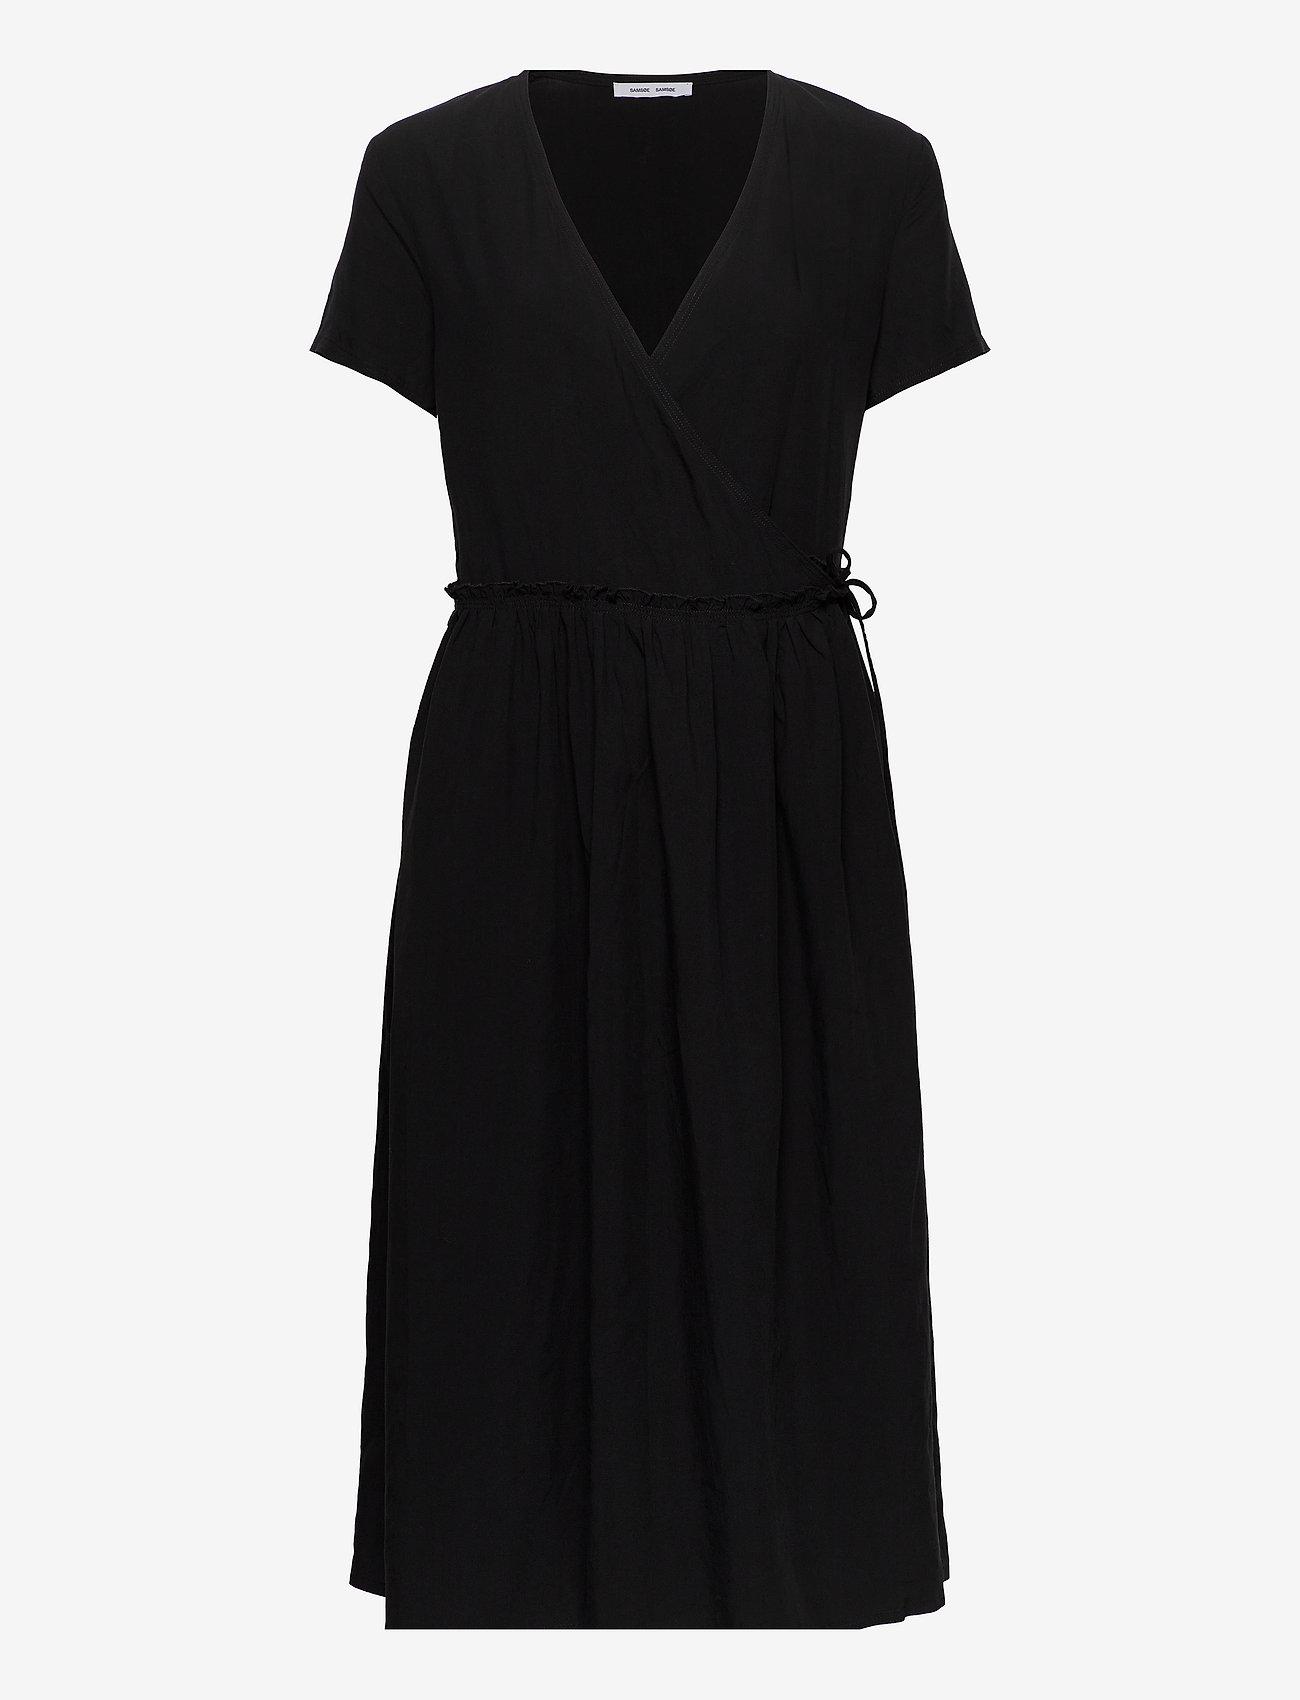 Samsøe Samsøe - Fiona dress 12686 - sommerkjoler - black - 0